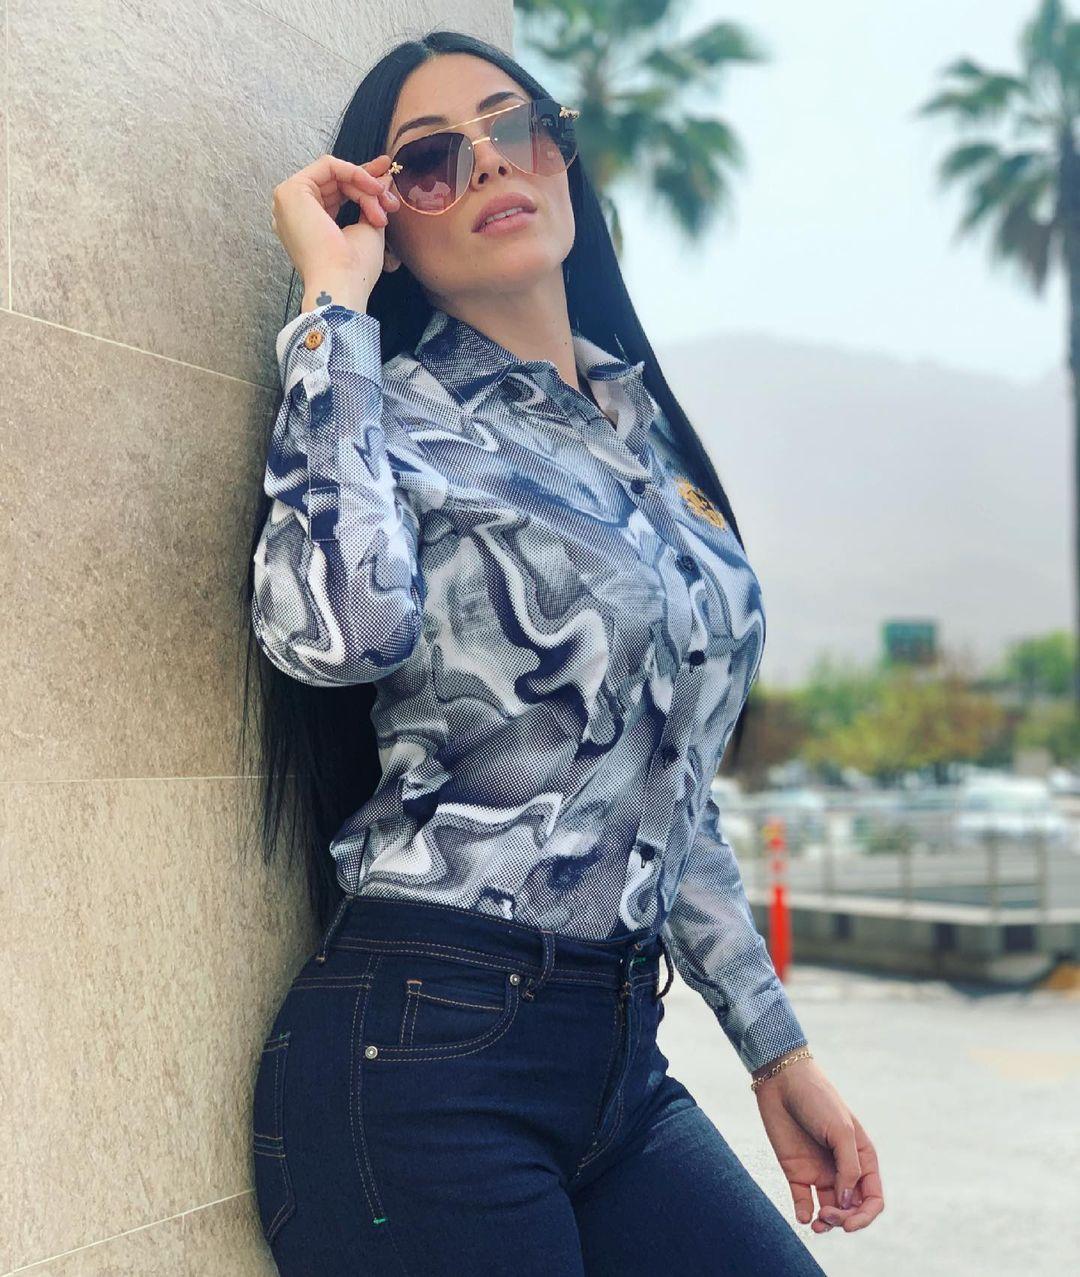 Ruby-Gonzalez-Wallpapers-Insta-Fit-Bio-5